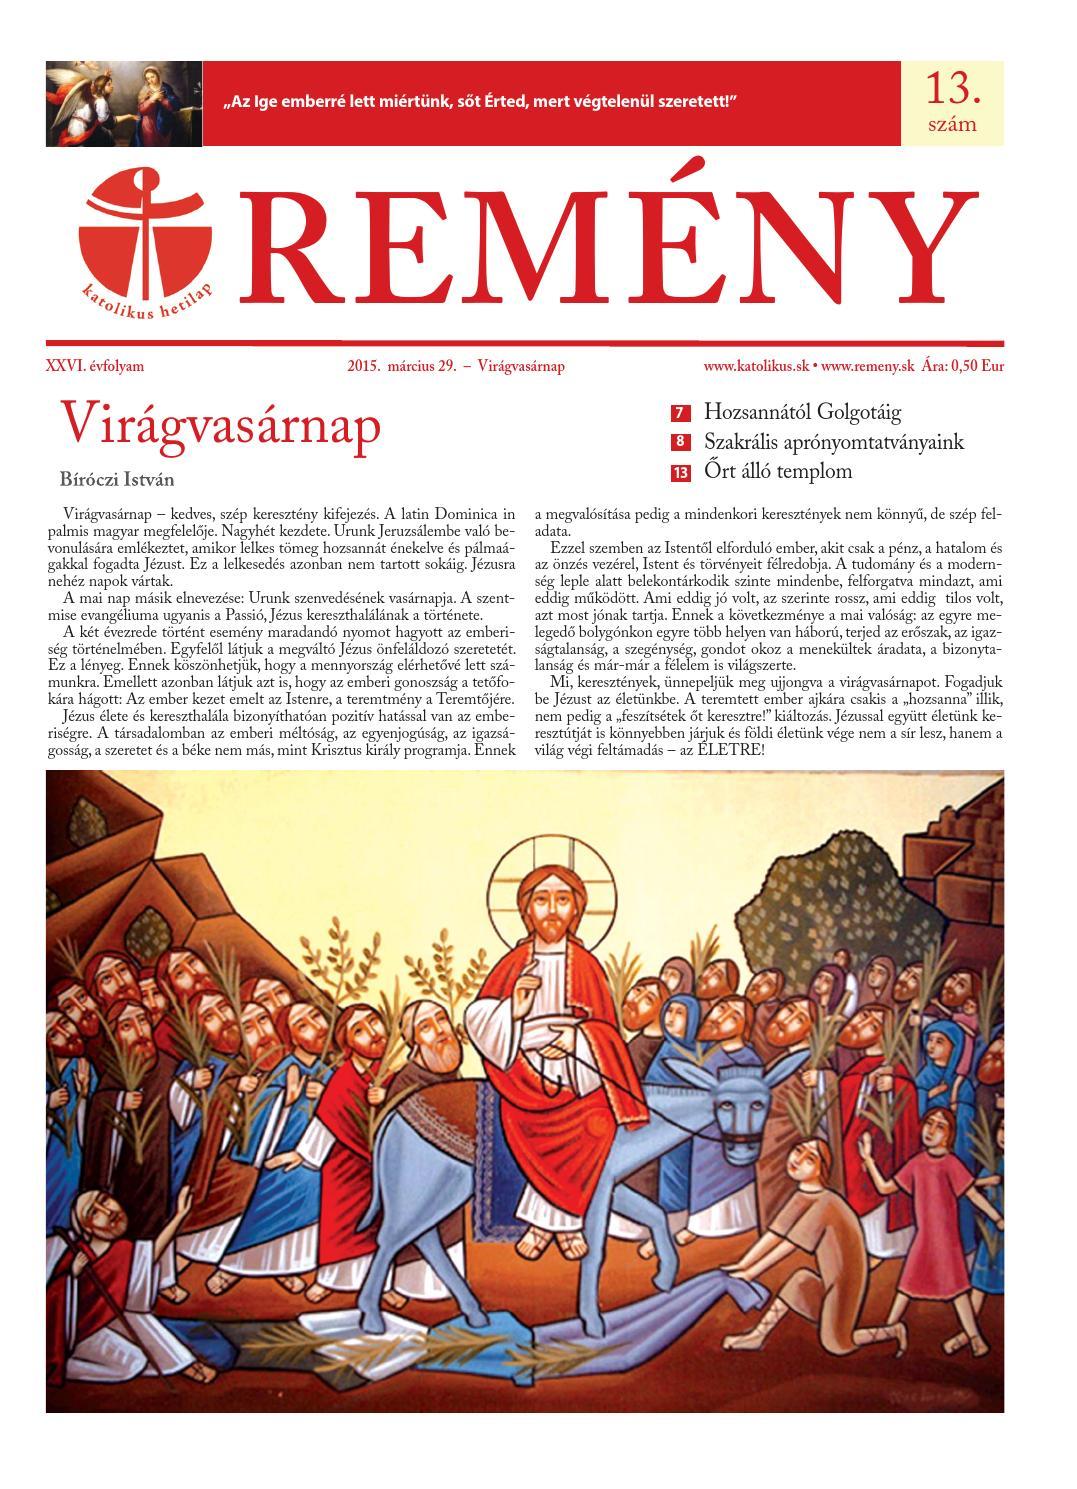 (PDF) Írásba foglalt vágyak és imák   Frauhammer Frauhammer - lugaskonyhak.hu